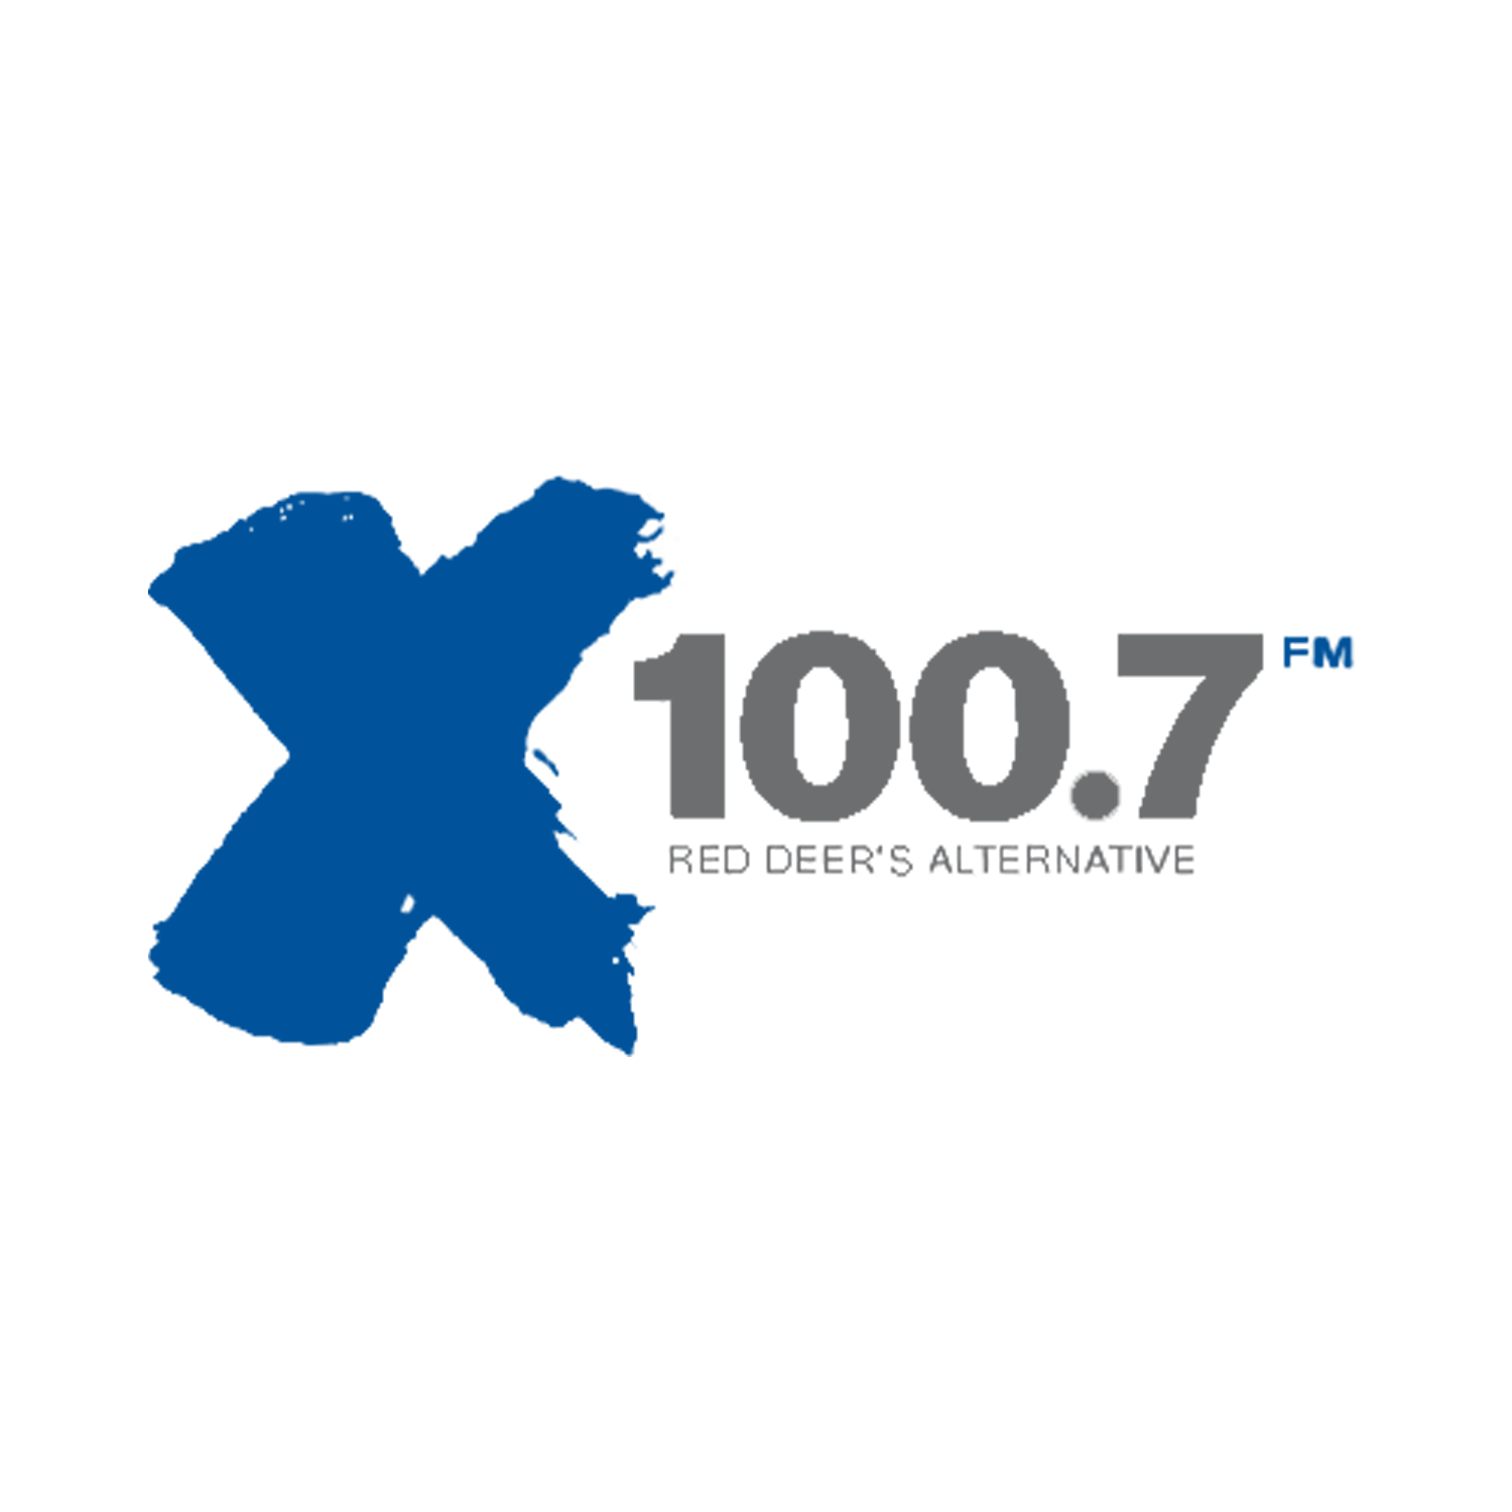 X 100.7